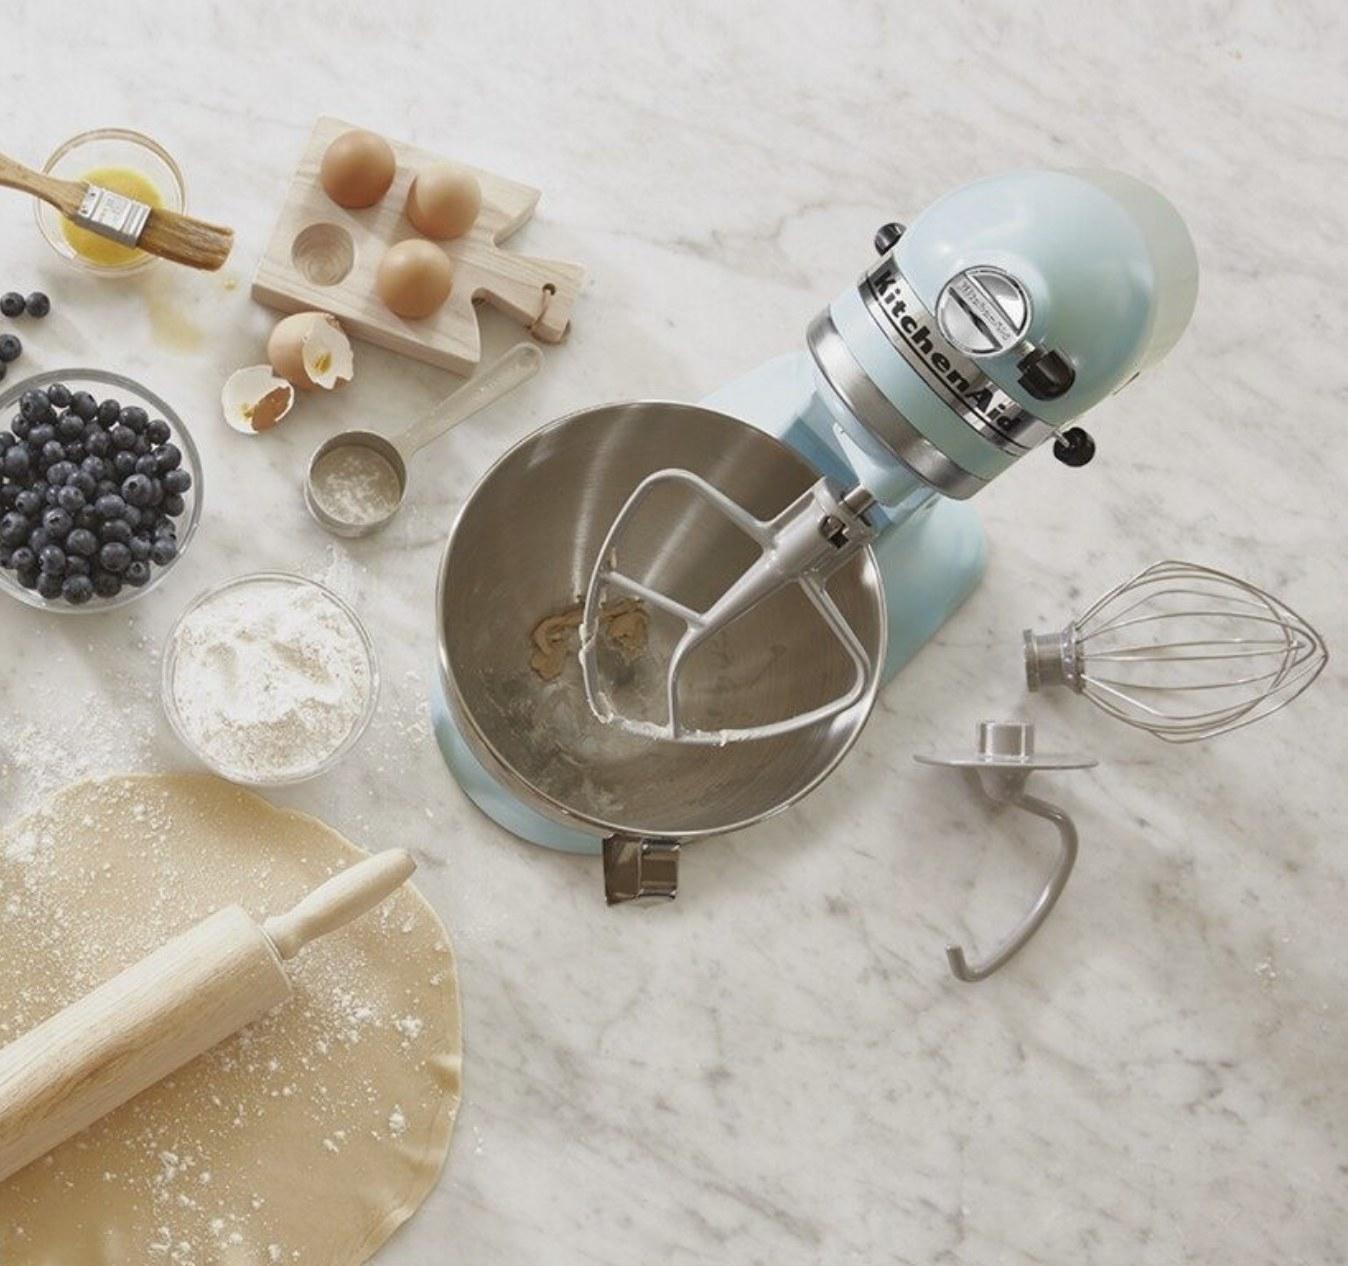 The light blue stand mixer